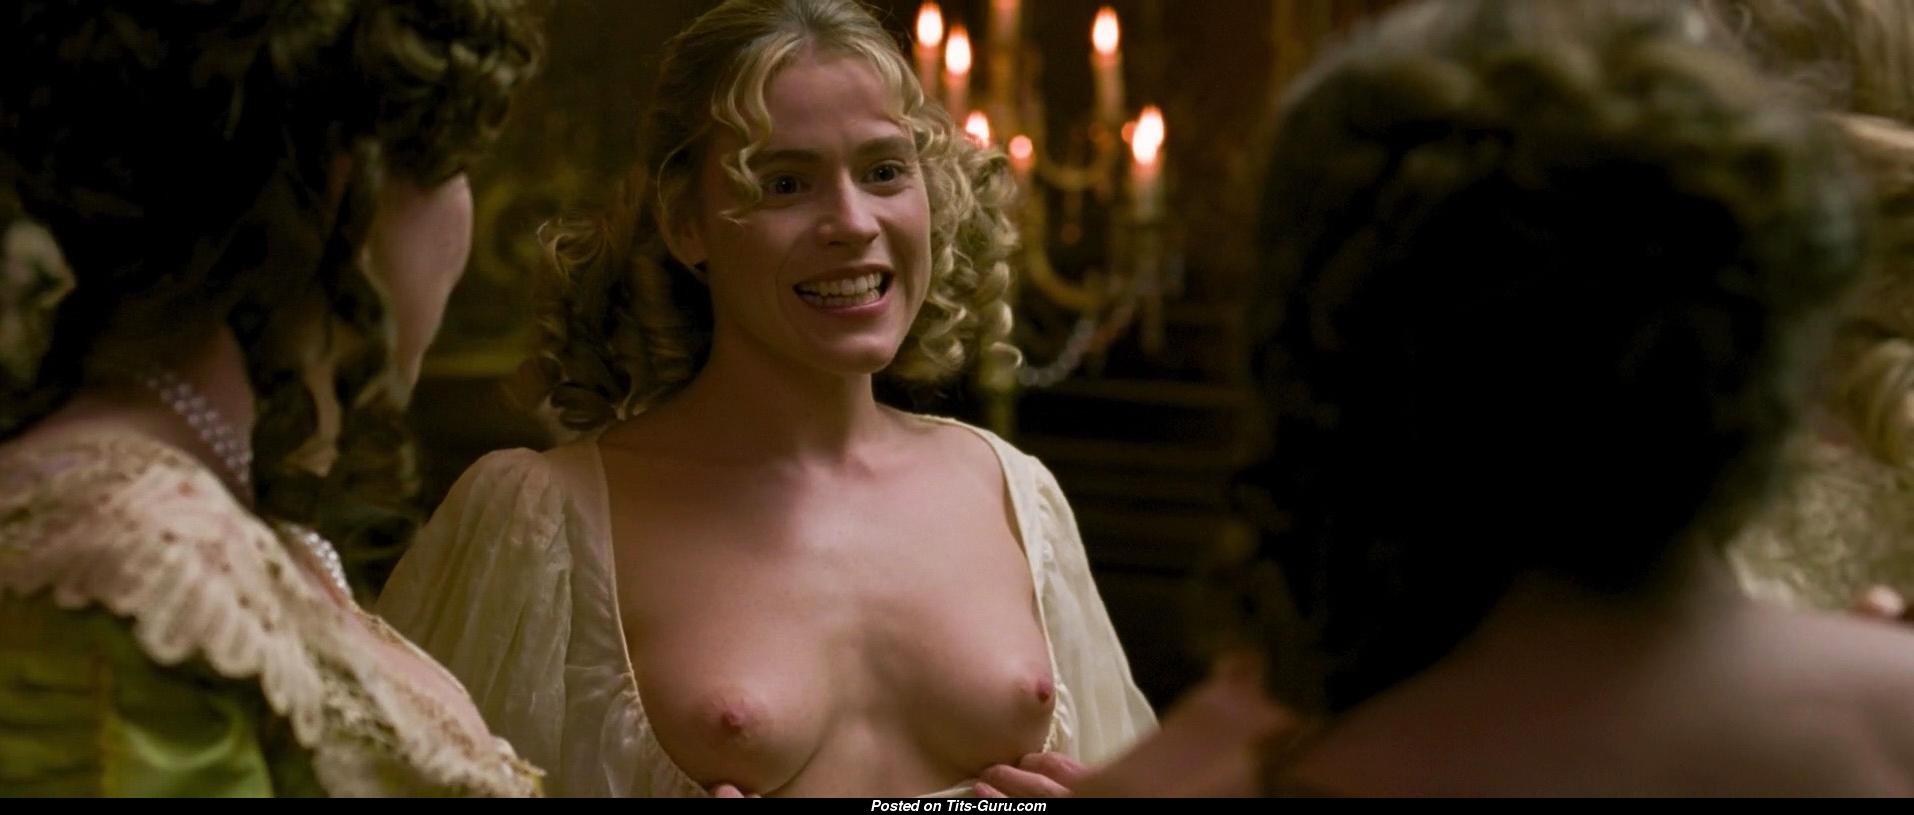 Kate winslet sexy boobs